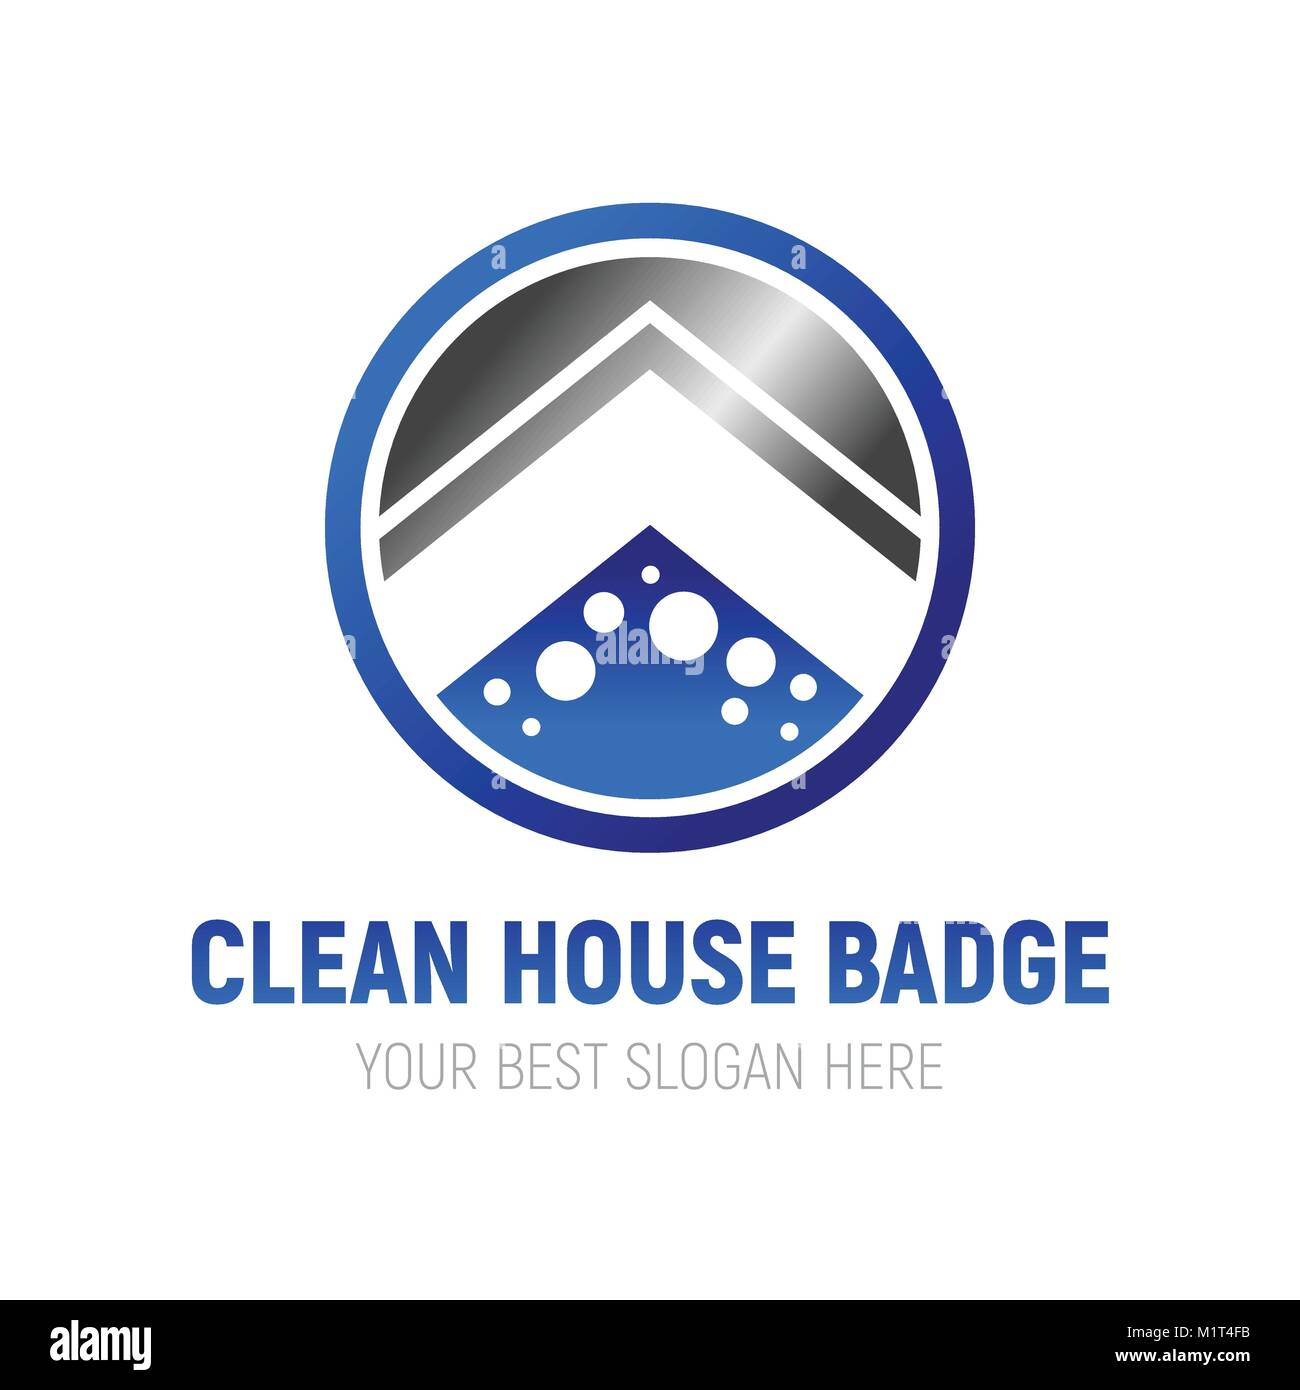 Clean House Badge Symbol Vector Graphic Logo Design - Stock Image